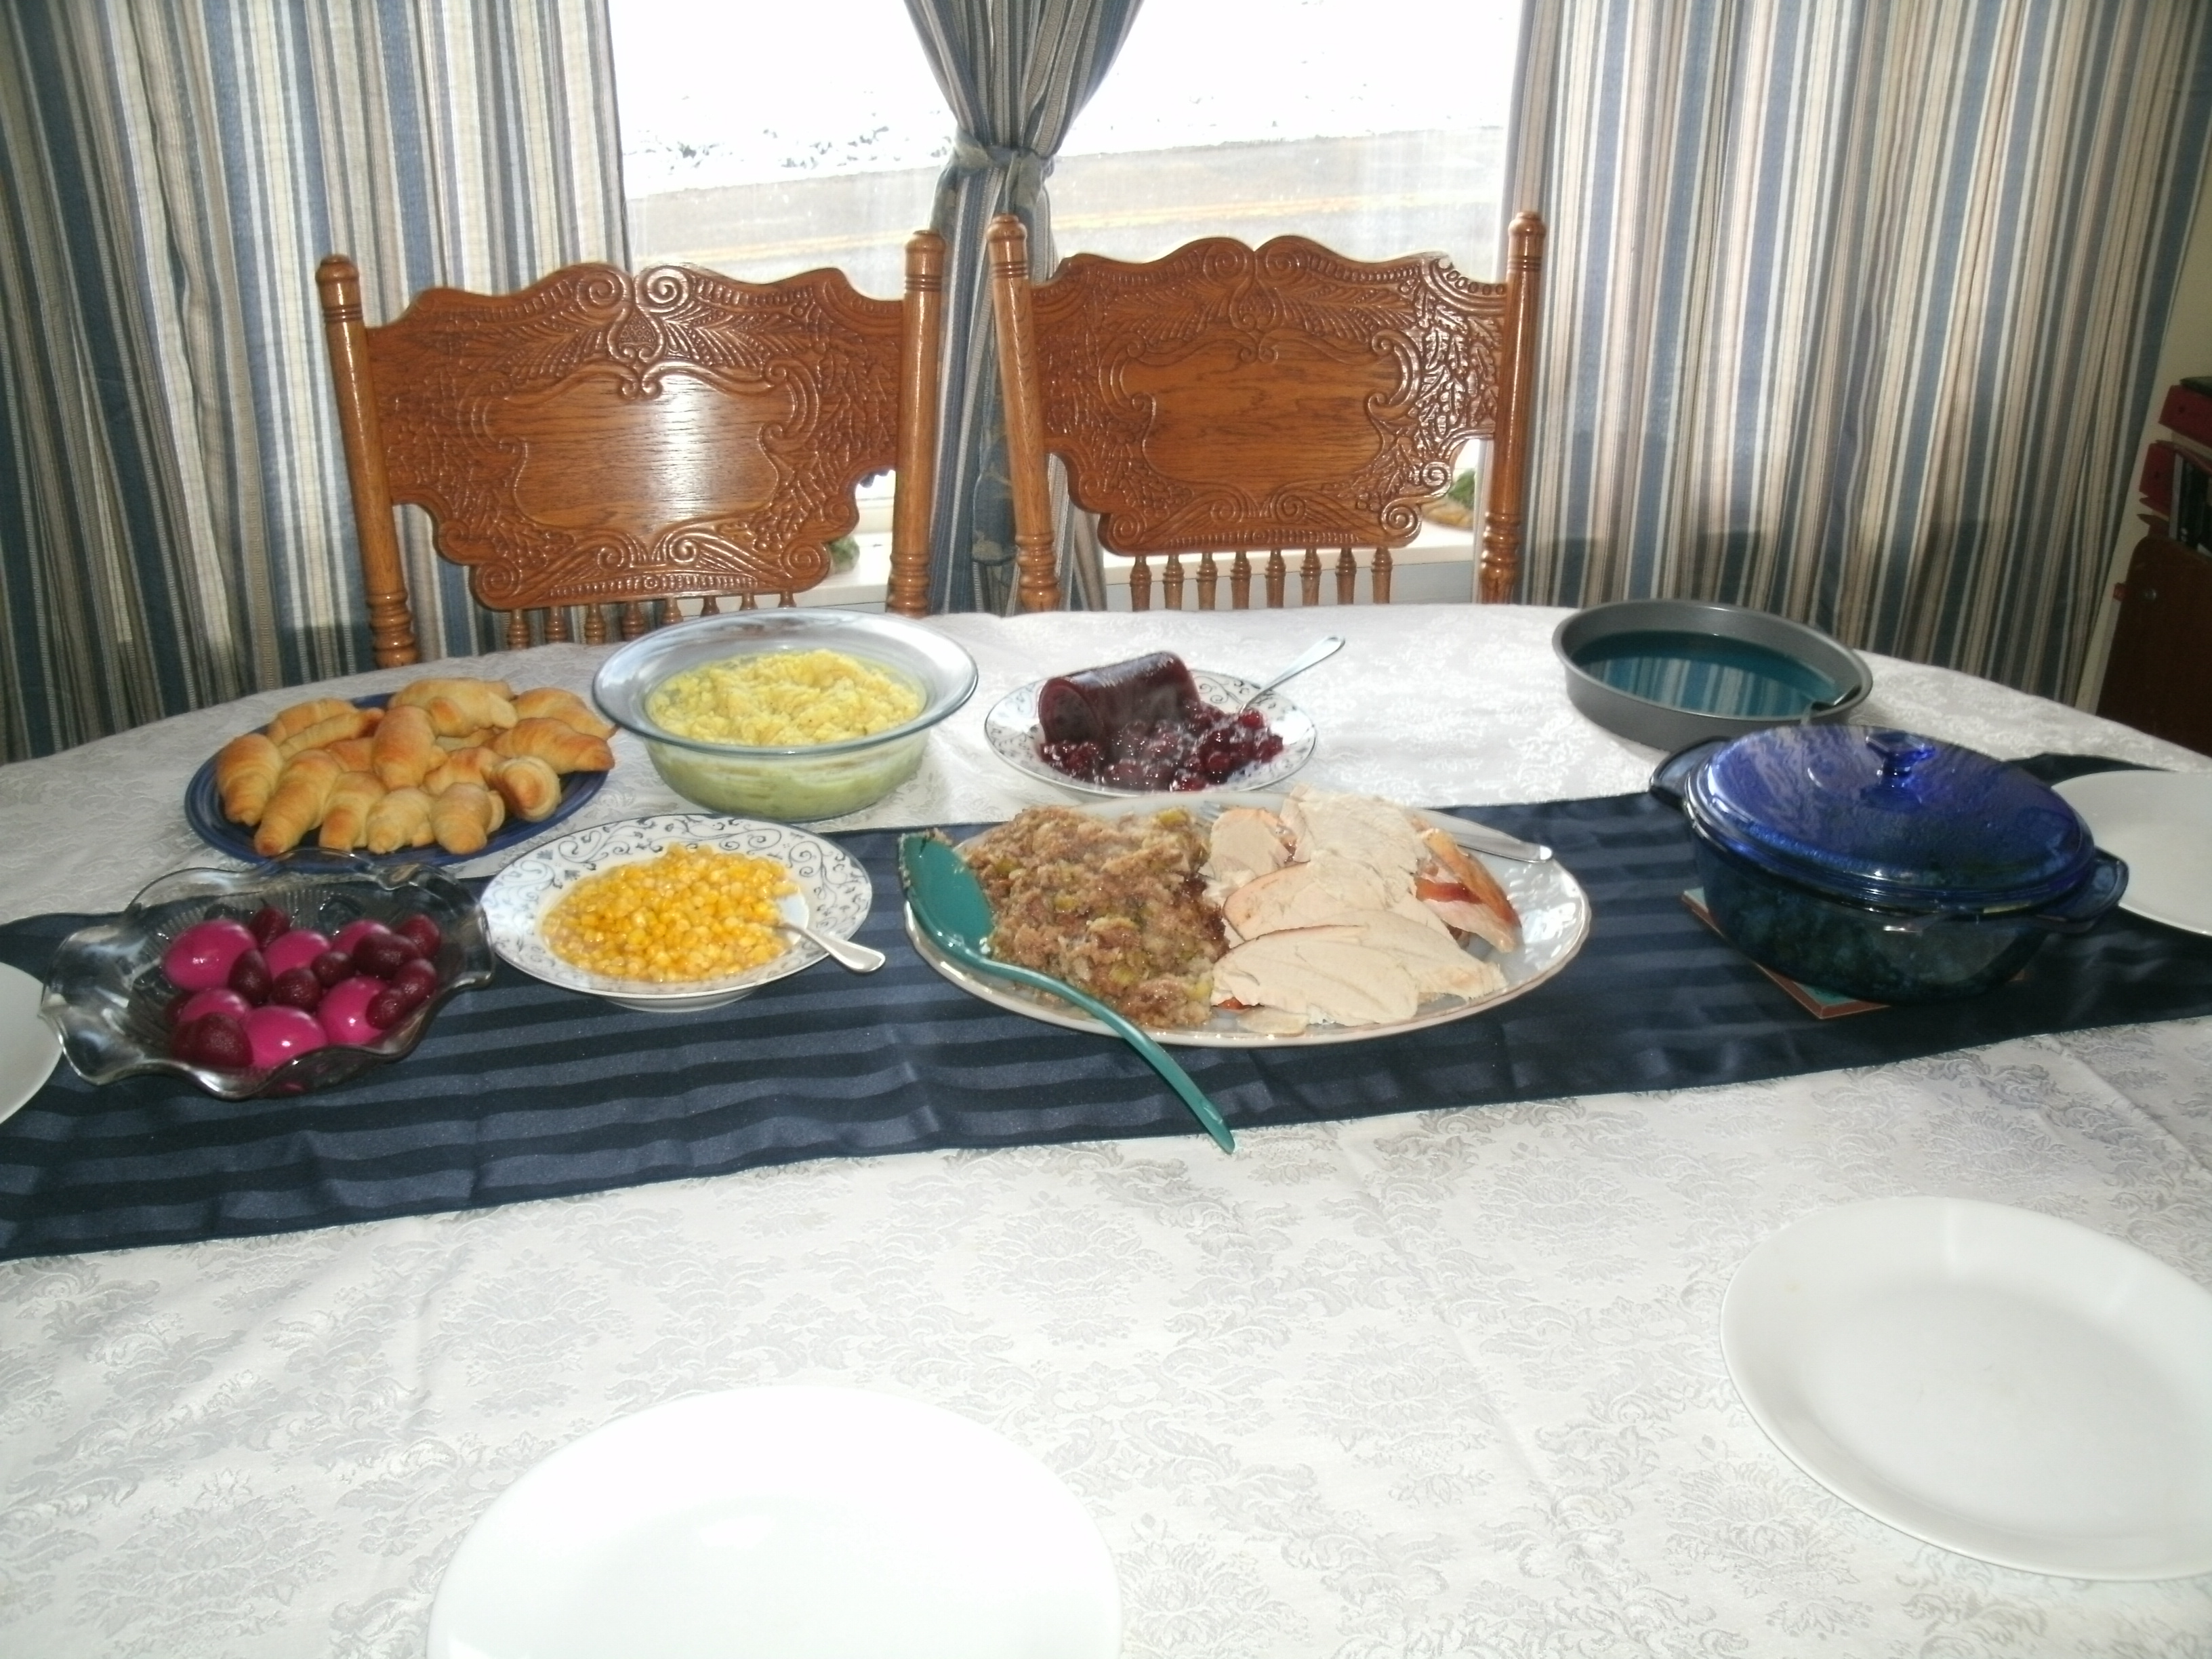 Memories of Grandpaw P. and Mock Mince Meat Pie | West Virginia ...